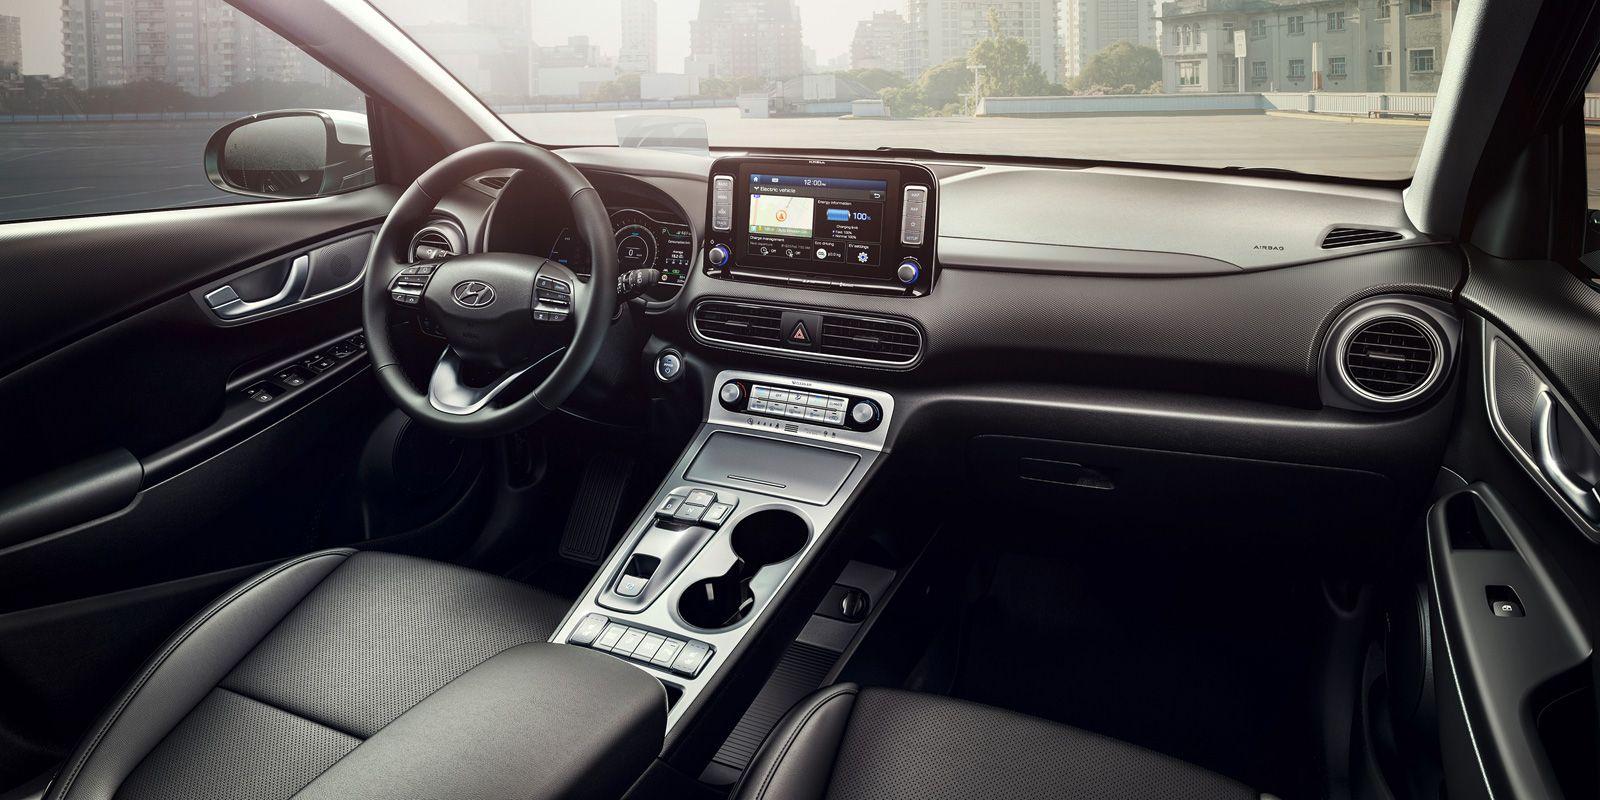 Hyundai S Kona Electric Suv Boasts A 292 Mile Range Elektromobil Dvigatel